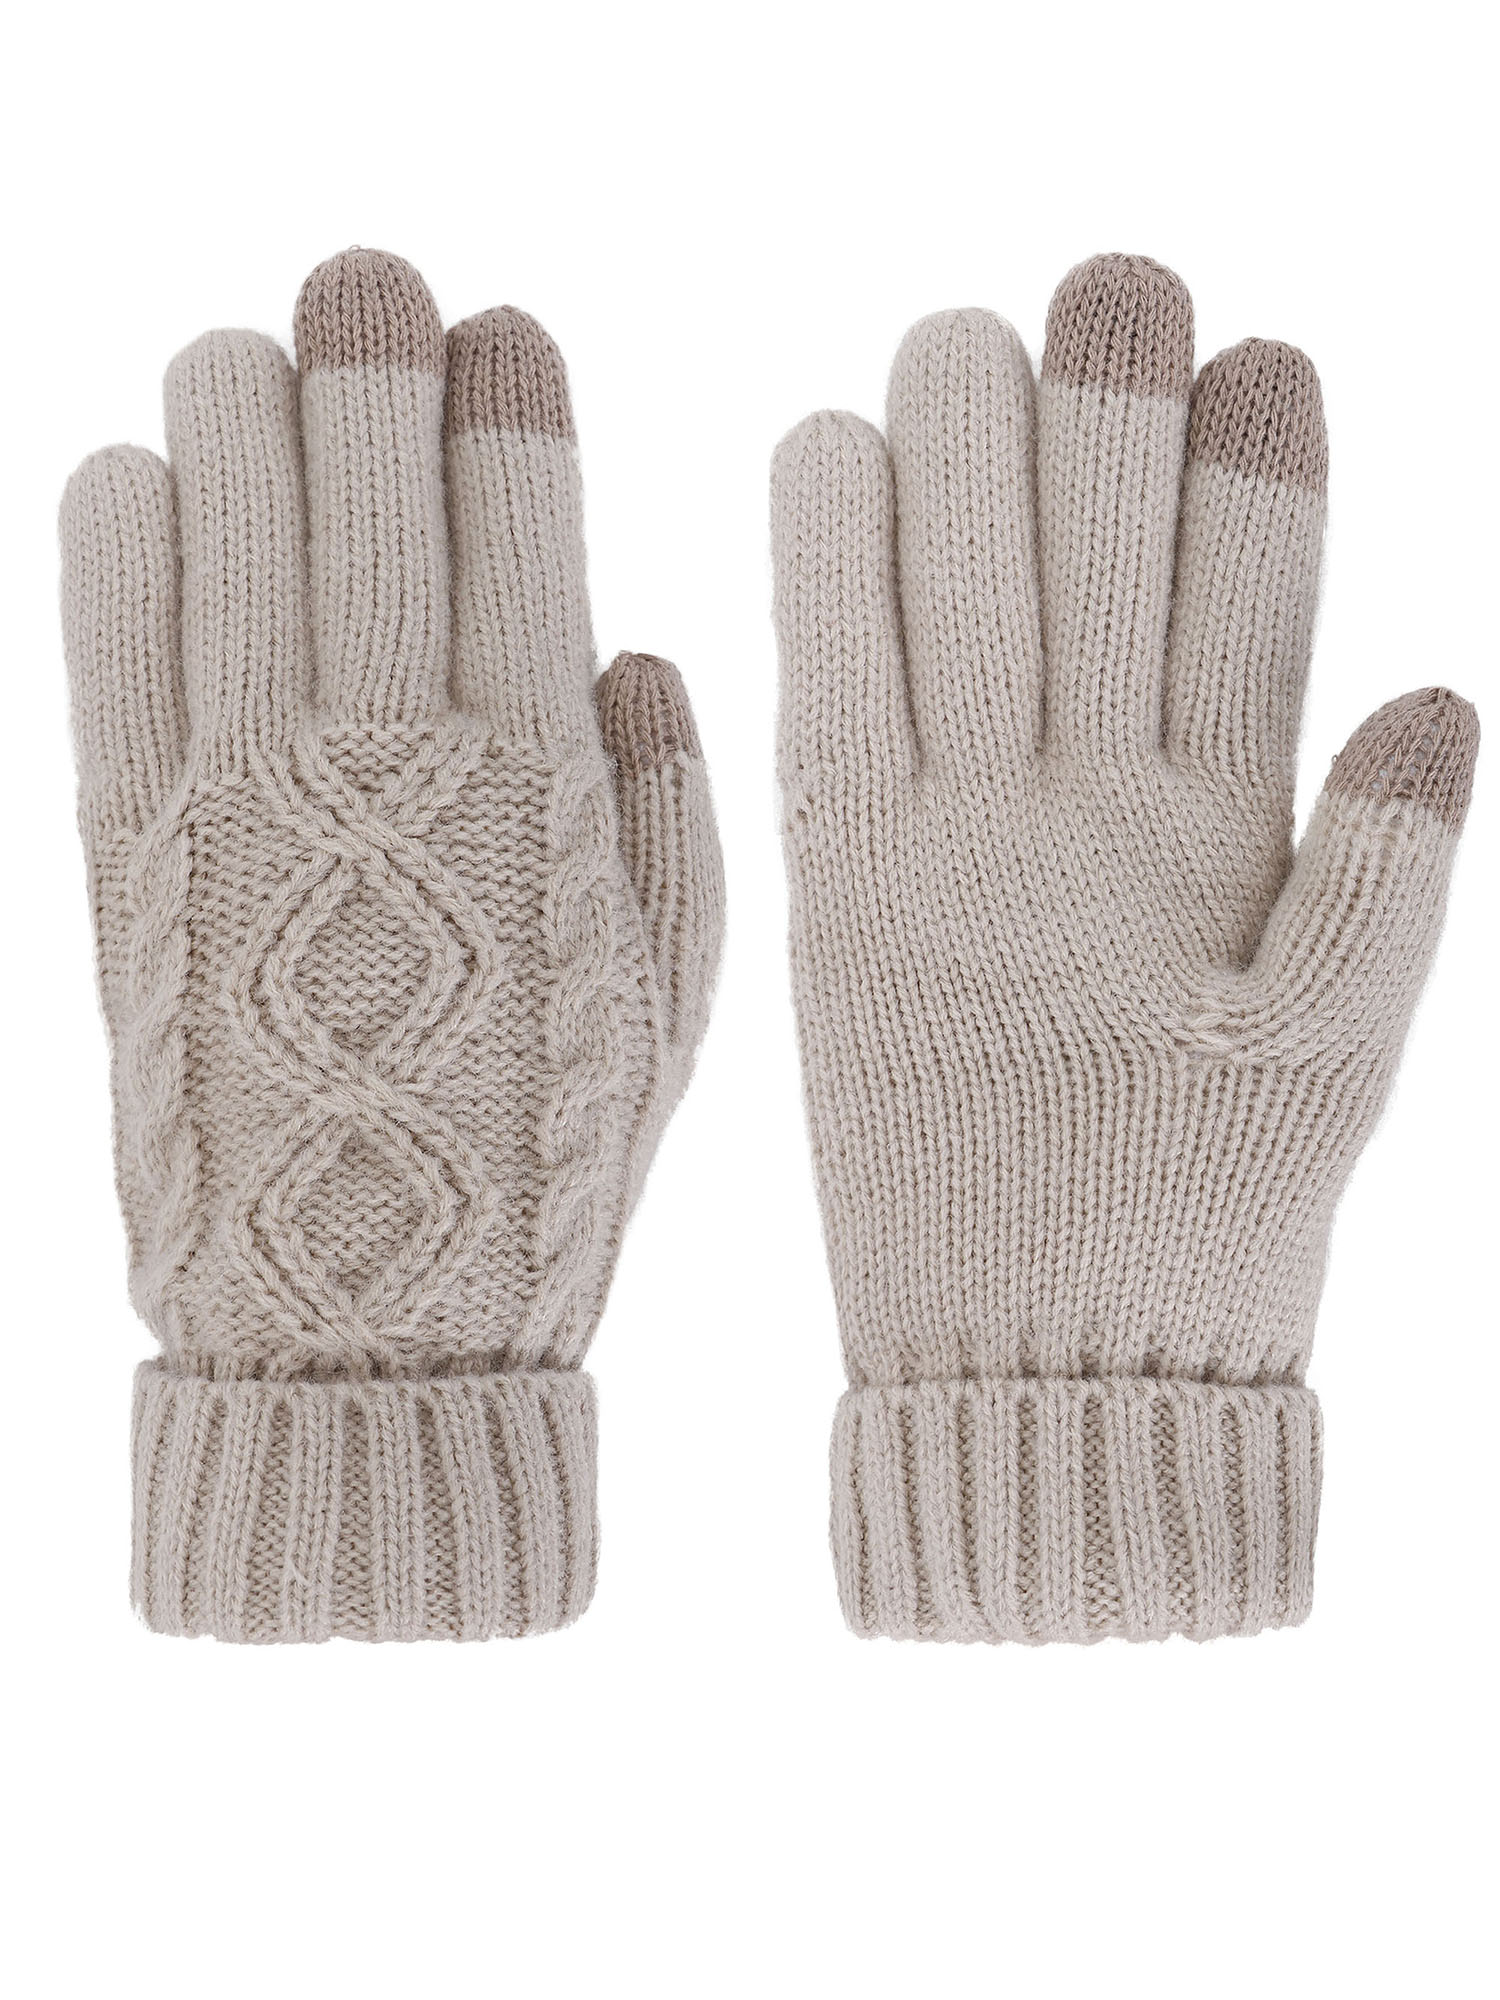 Women's Three Fingers Touchscreen Knit Gloves, Medium_Latte